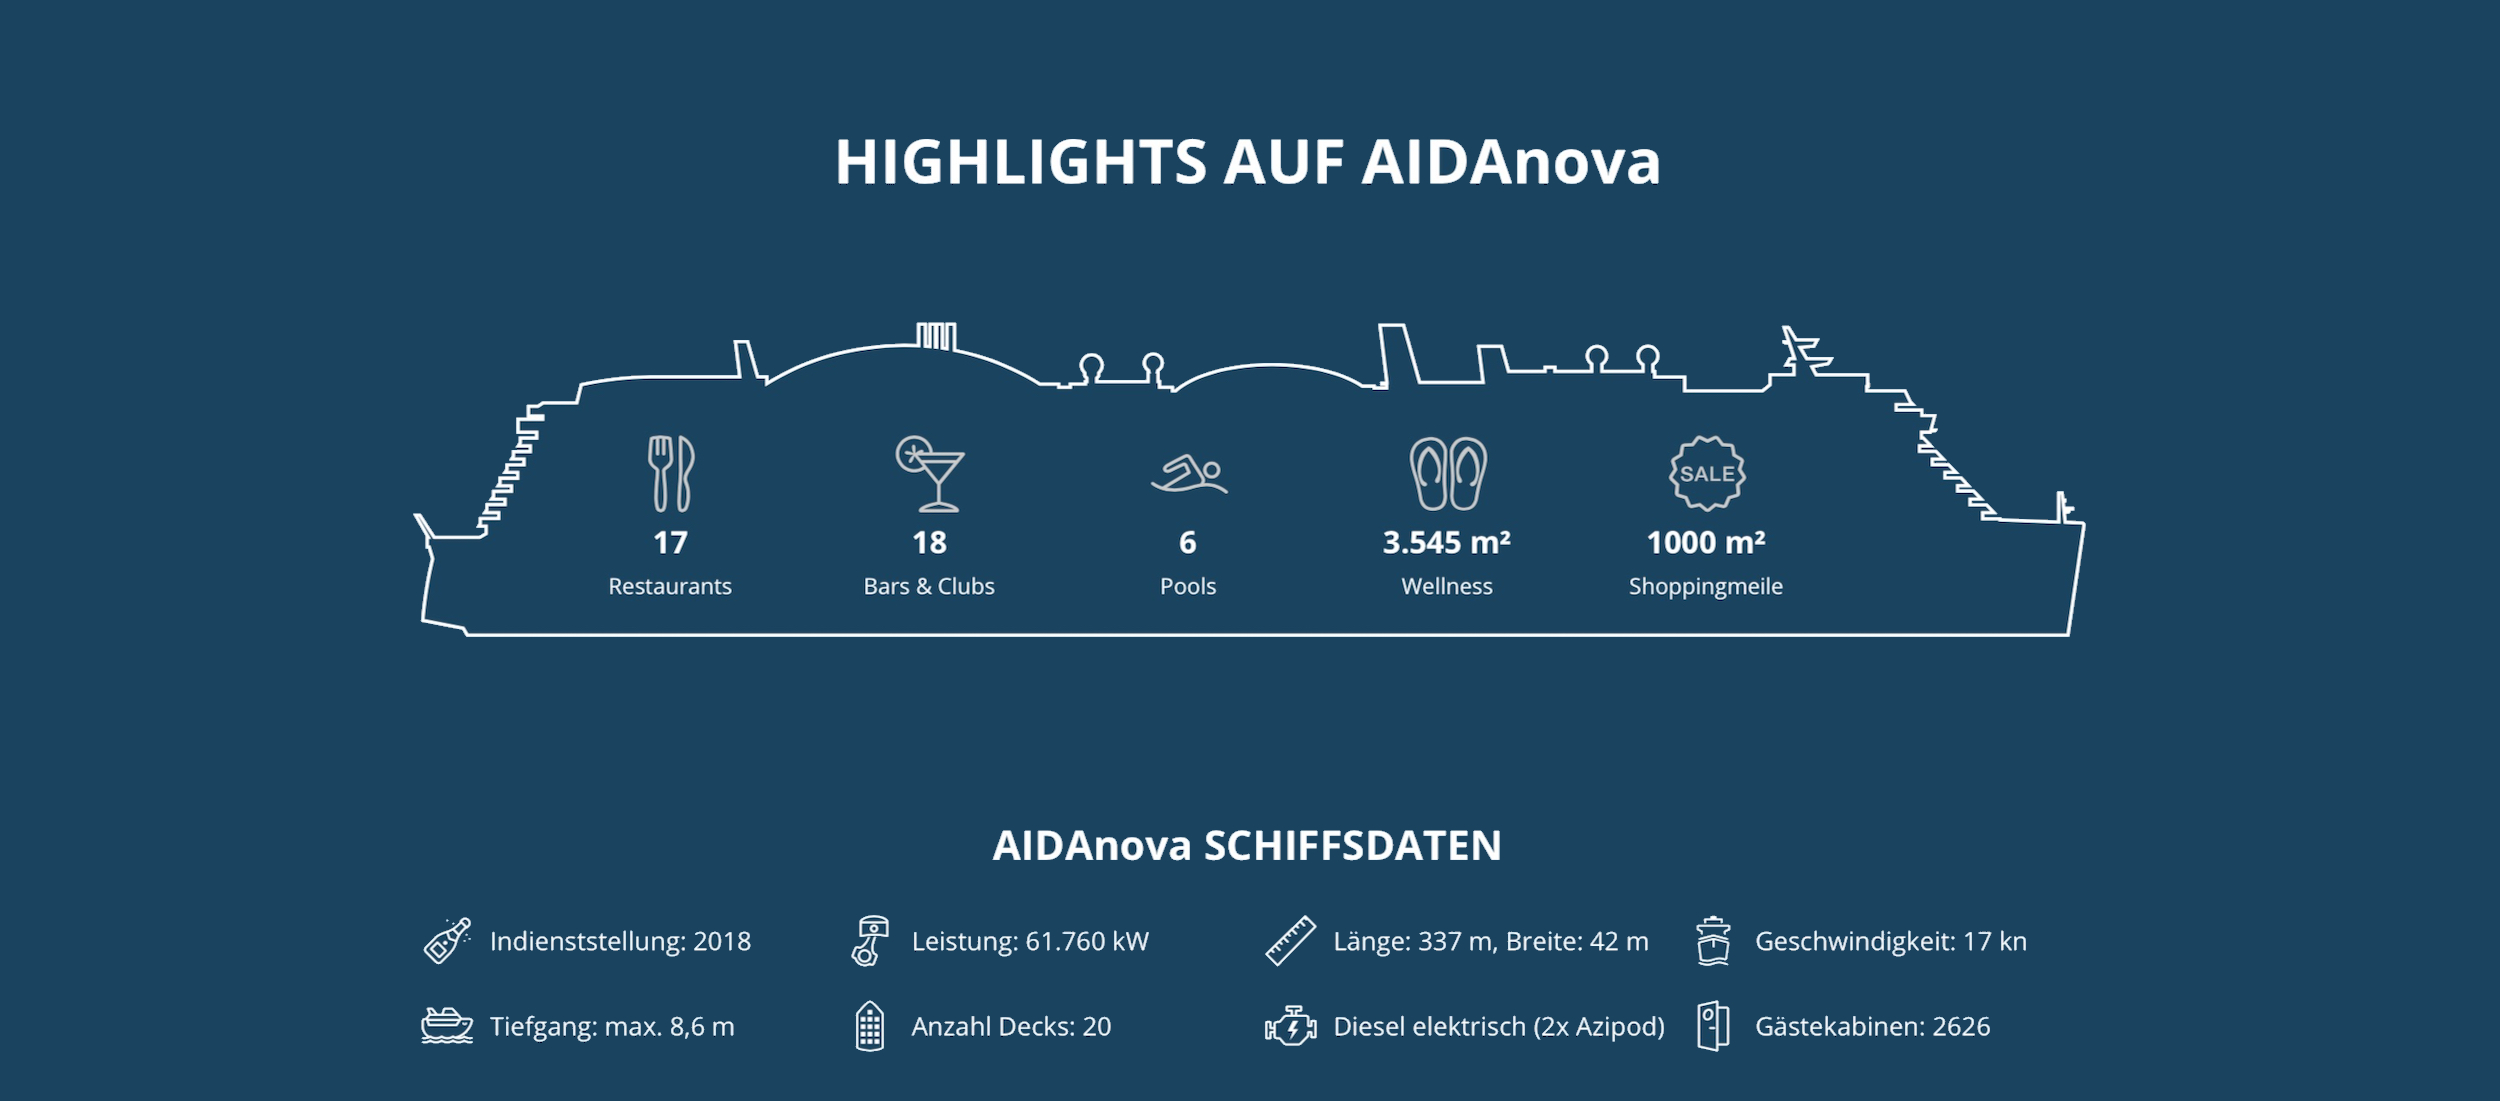 aida-cruises-ships-aidanova-daten